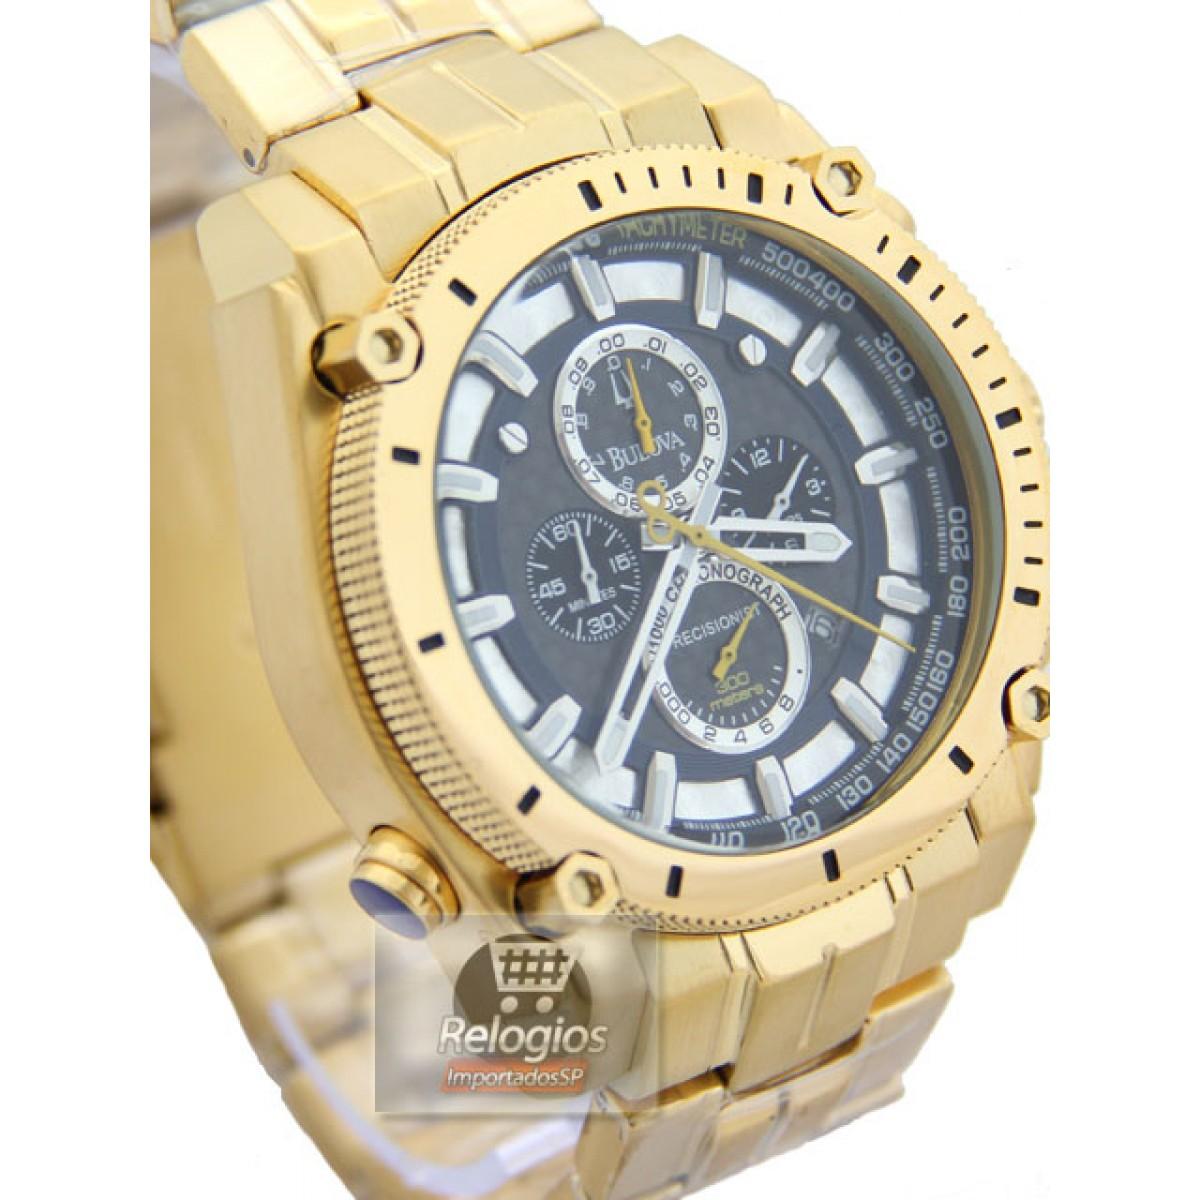 77de53f9ba1 Relógio Réplica Bulova 96b175 Gold Black